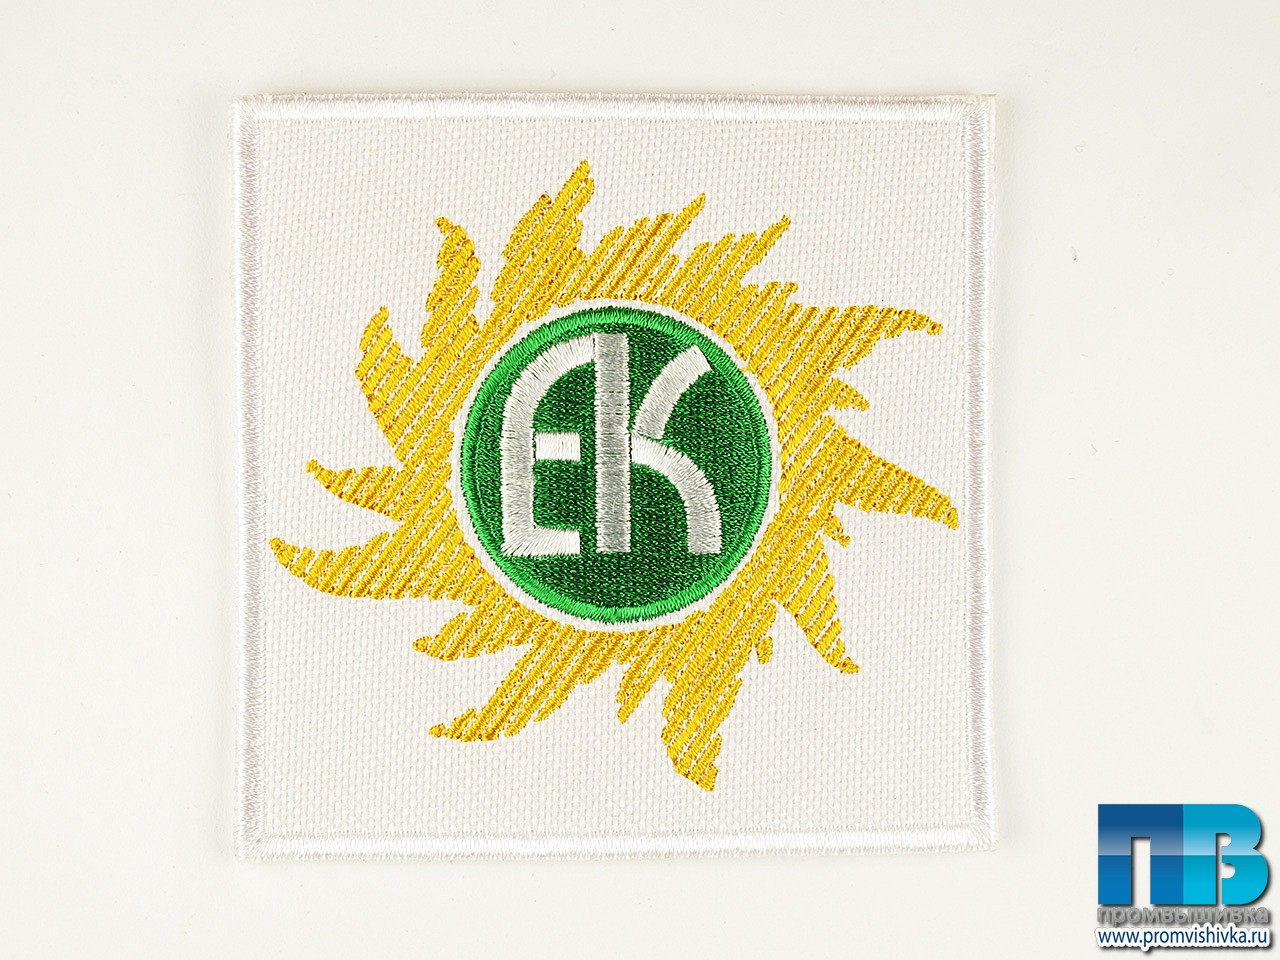 Вышивка логотипа на форме